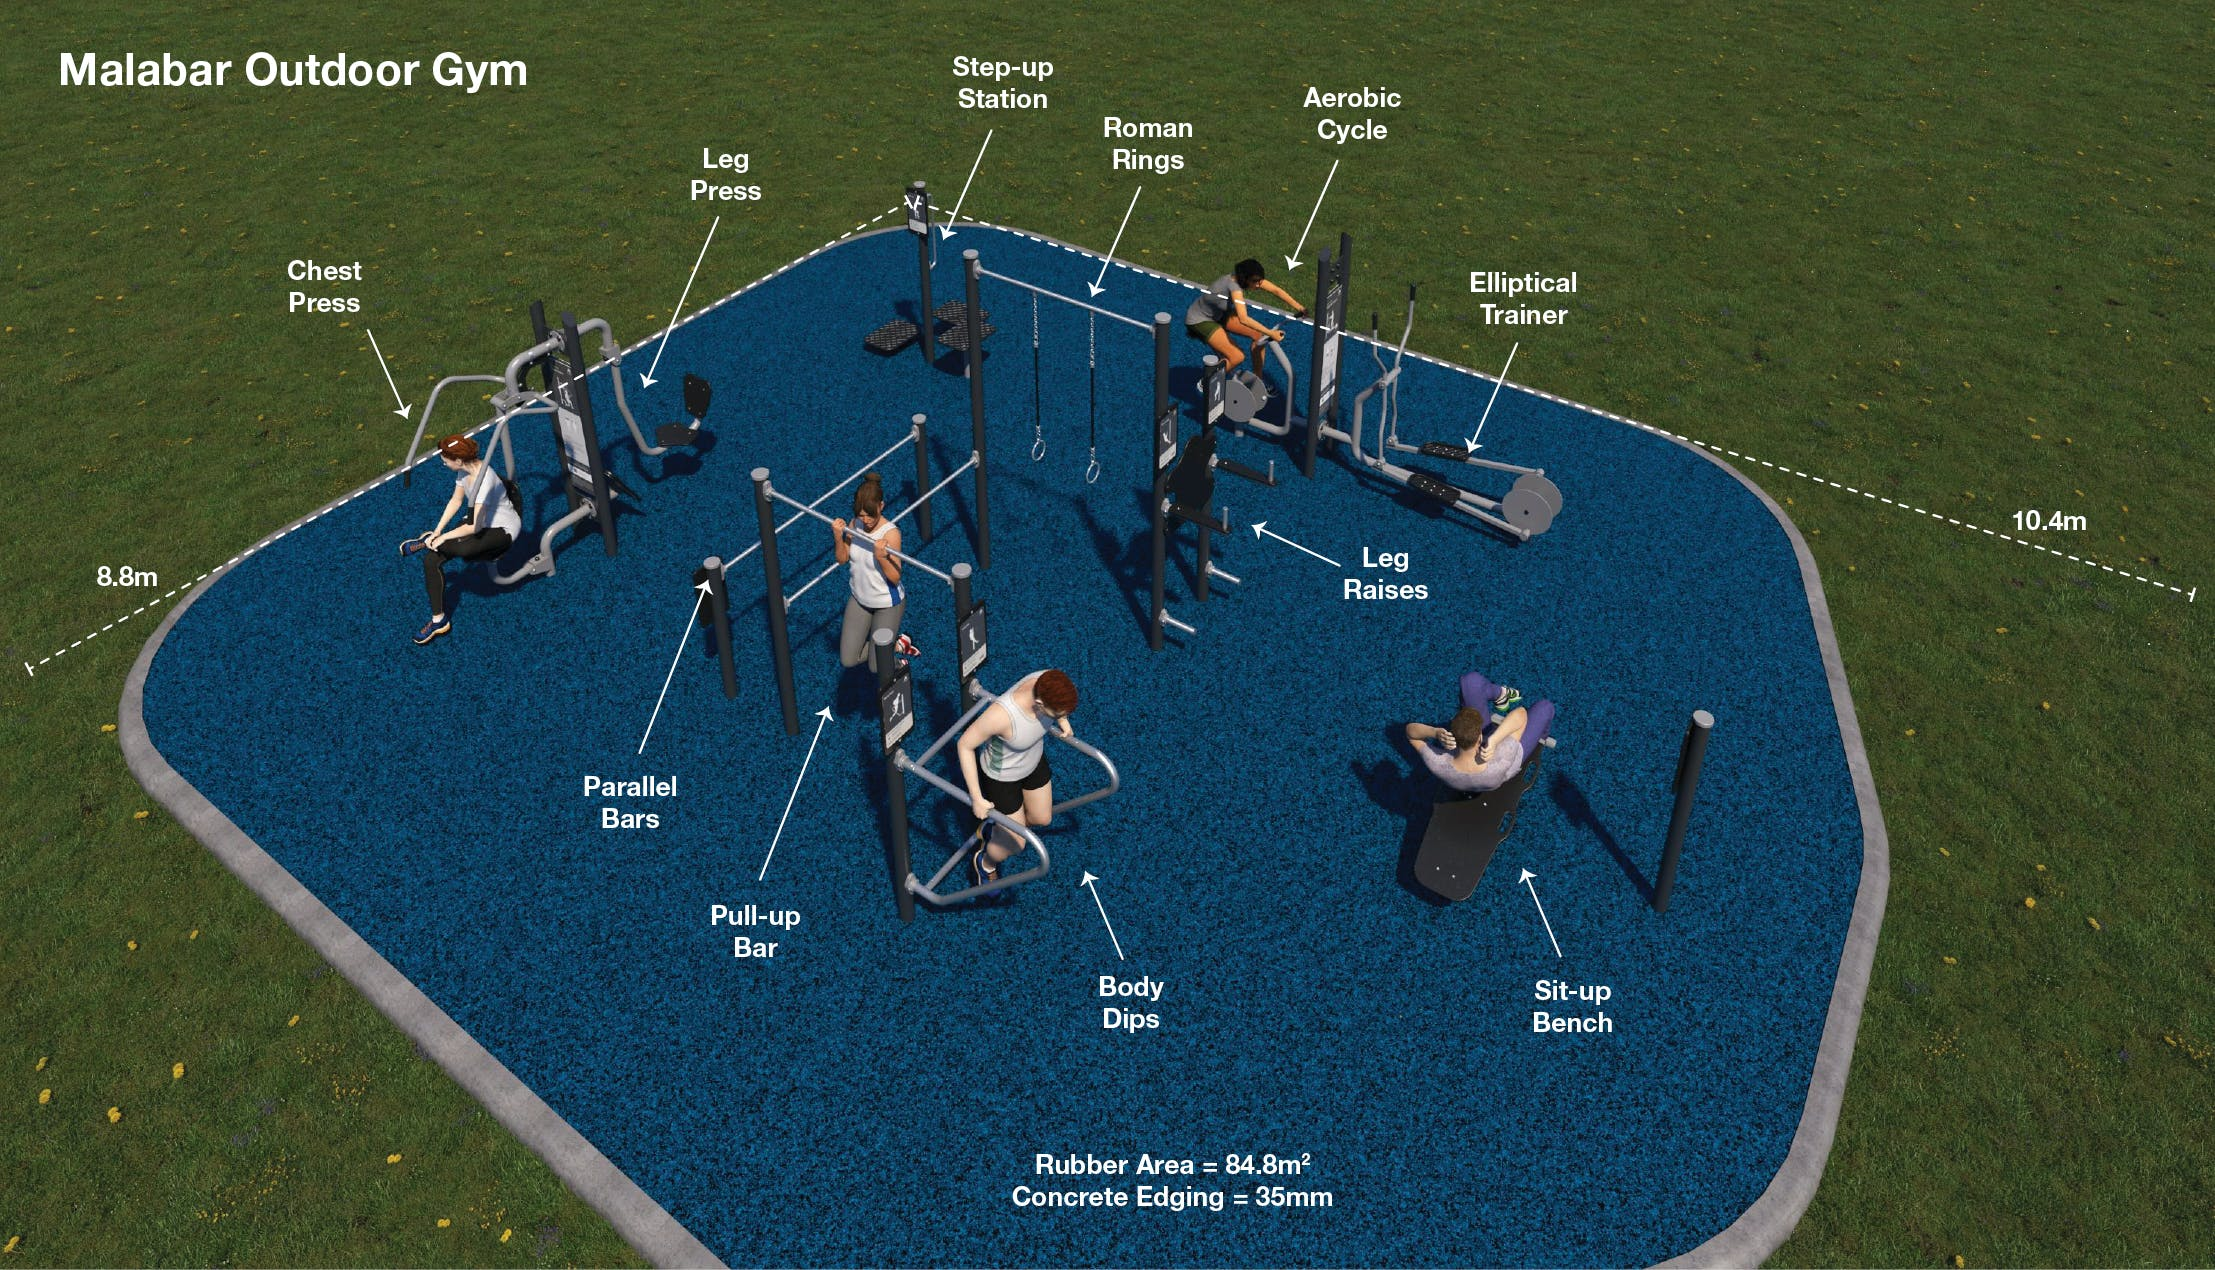 Malabar outdoor gym layout